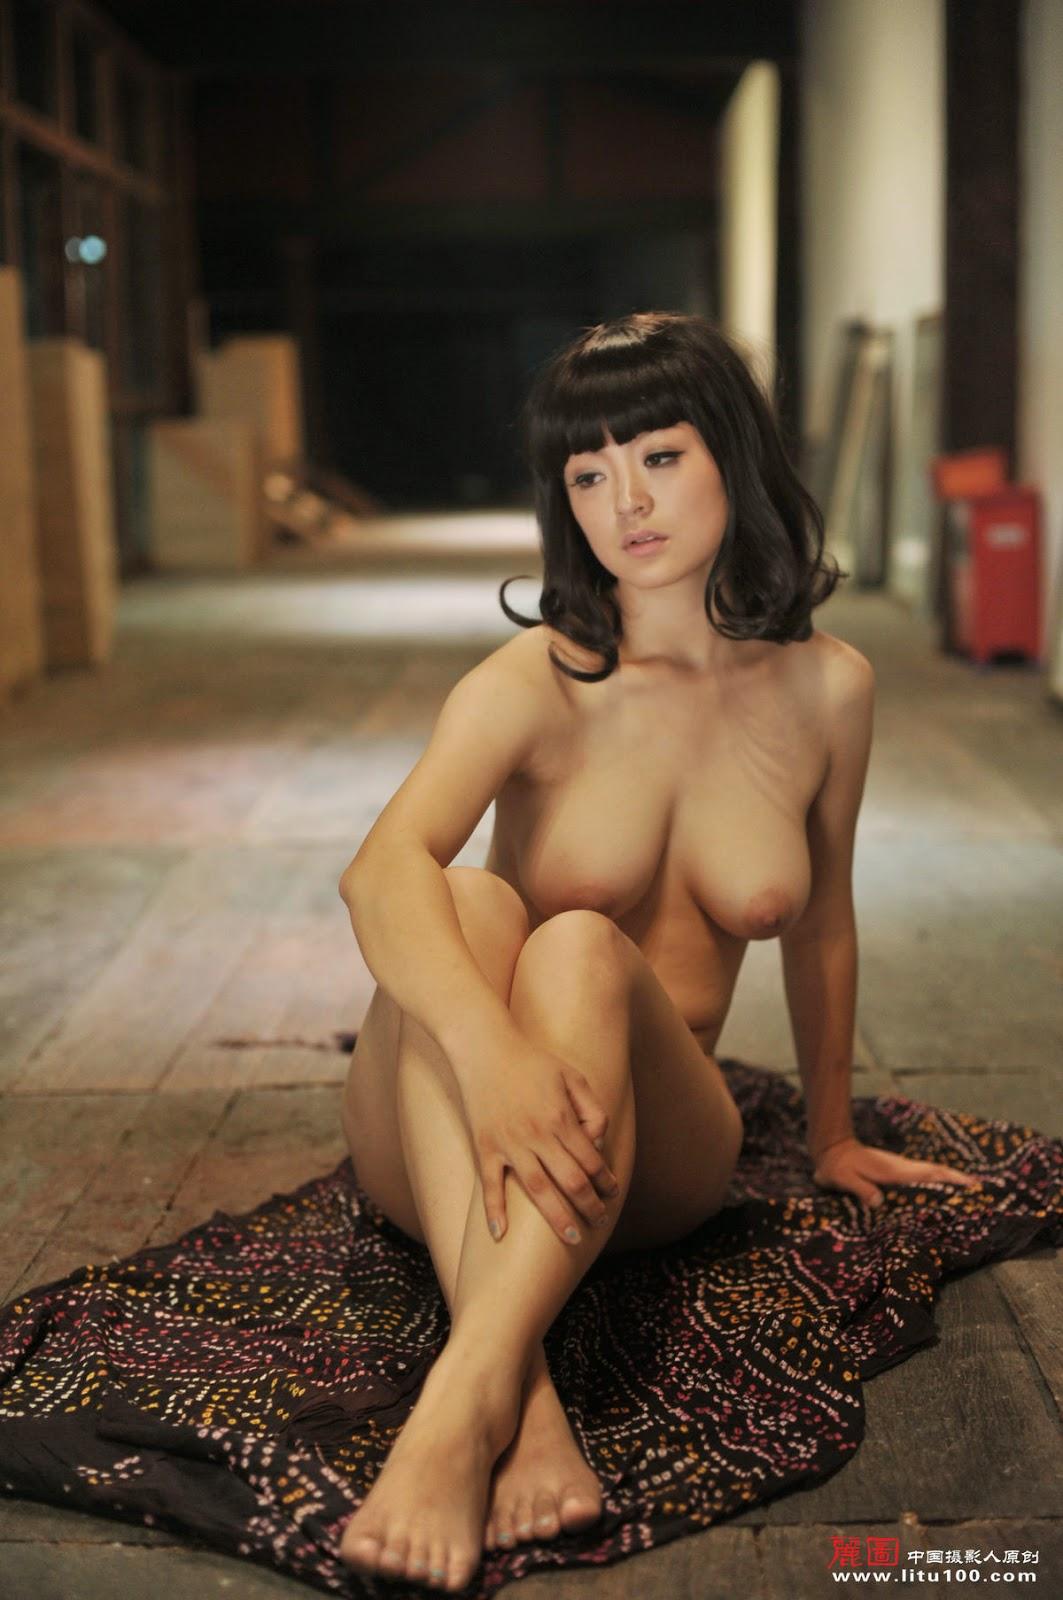 DSC 7297 - Chinese Nude Model Su Quan [Litu100]   18+ gallery photos